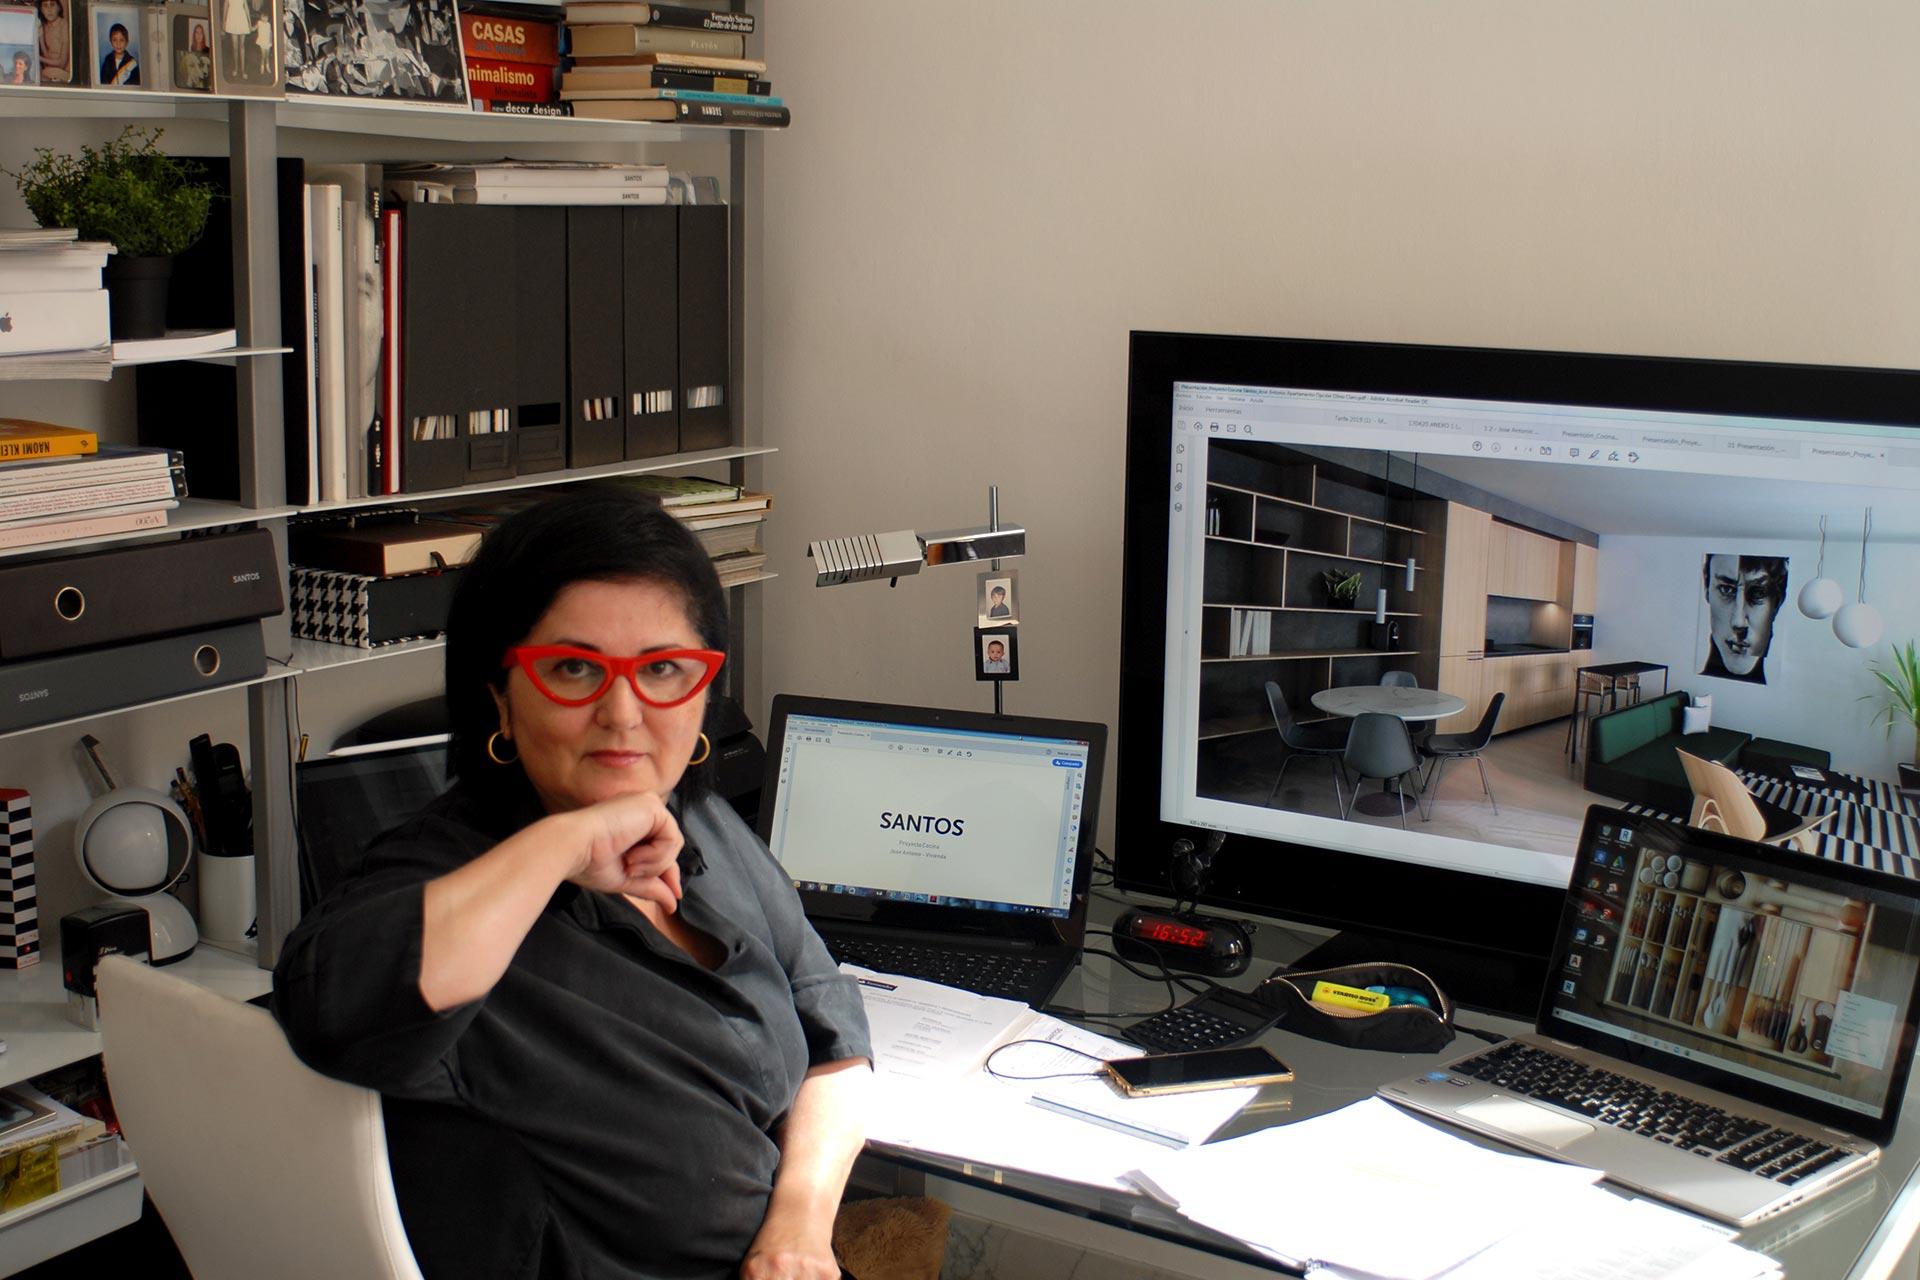 Rosario Martín Pérez, directeur, bestuurder en interieurontwerper van Zona de Día